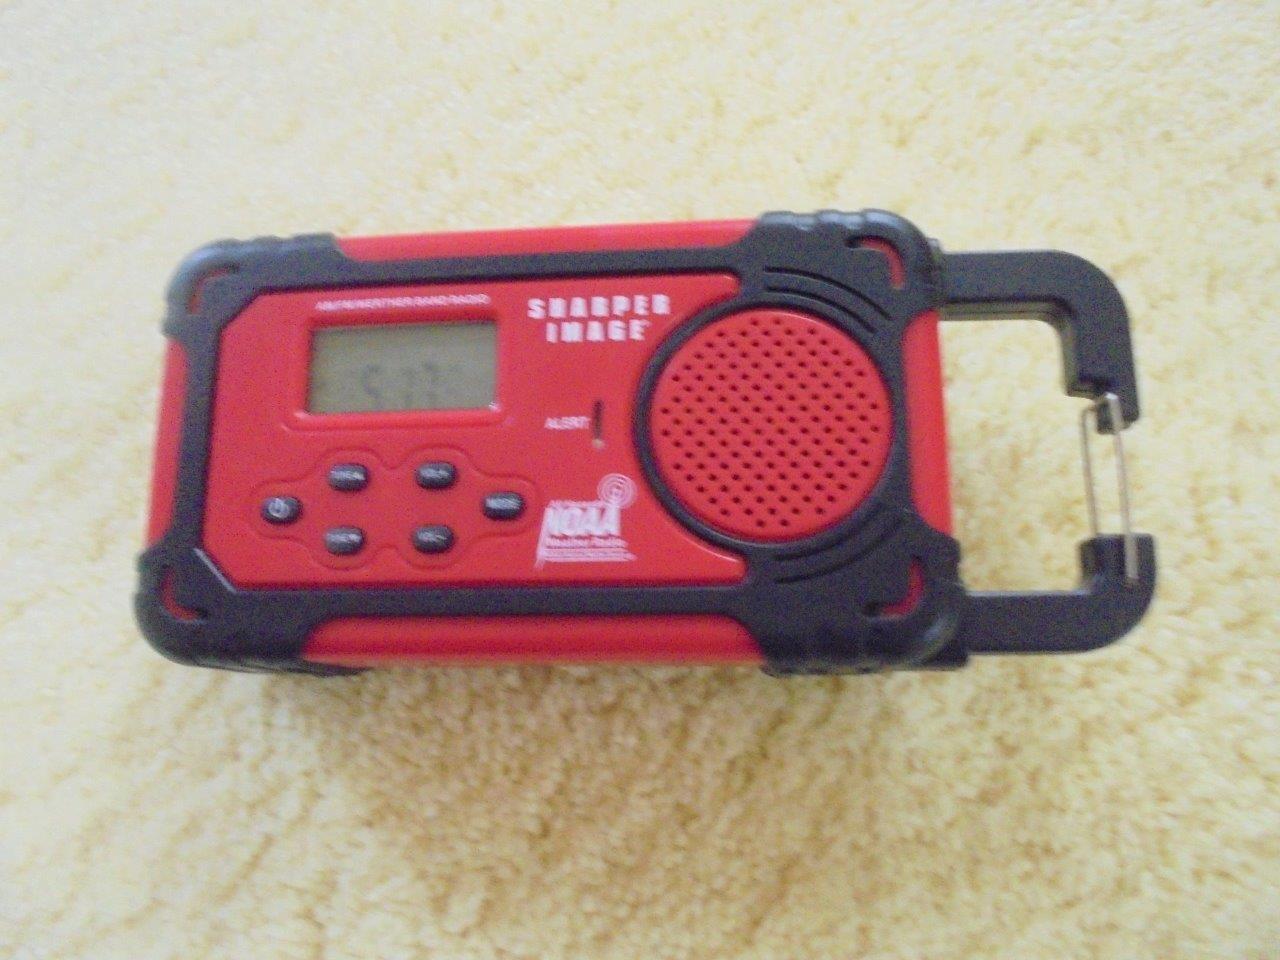 Sharper Image Solar Hand Cranked  Dynamo Power Radio  Multi-Purpose USB Charger  best price